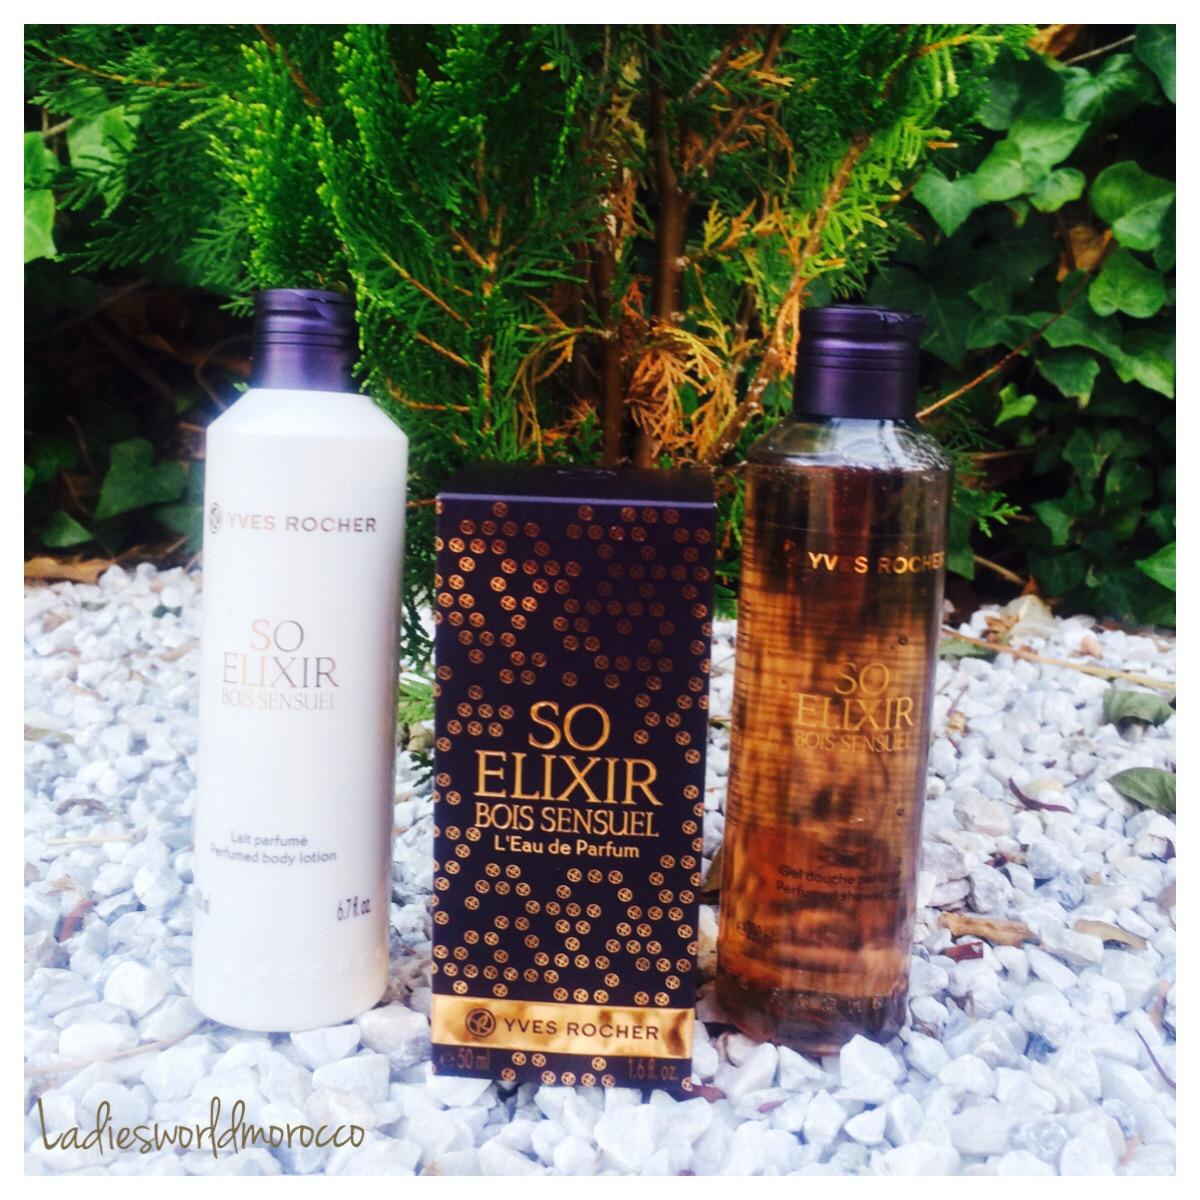 Le nouveau So Elixir Bois Sensuel de chez Yves Rocher # So Elixir Bois Sensuel